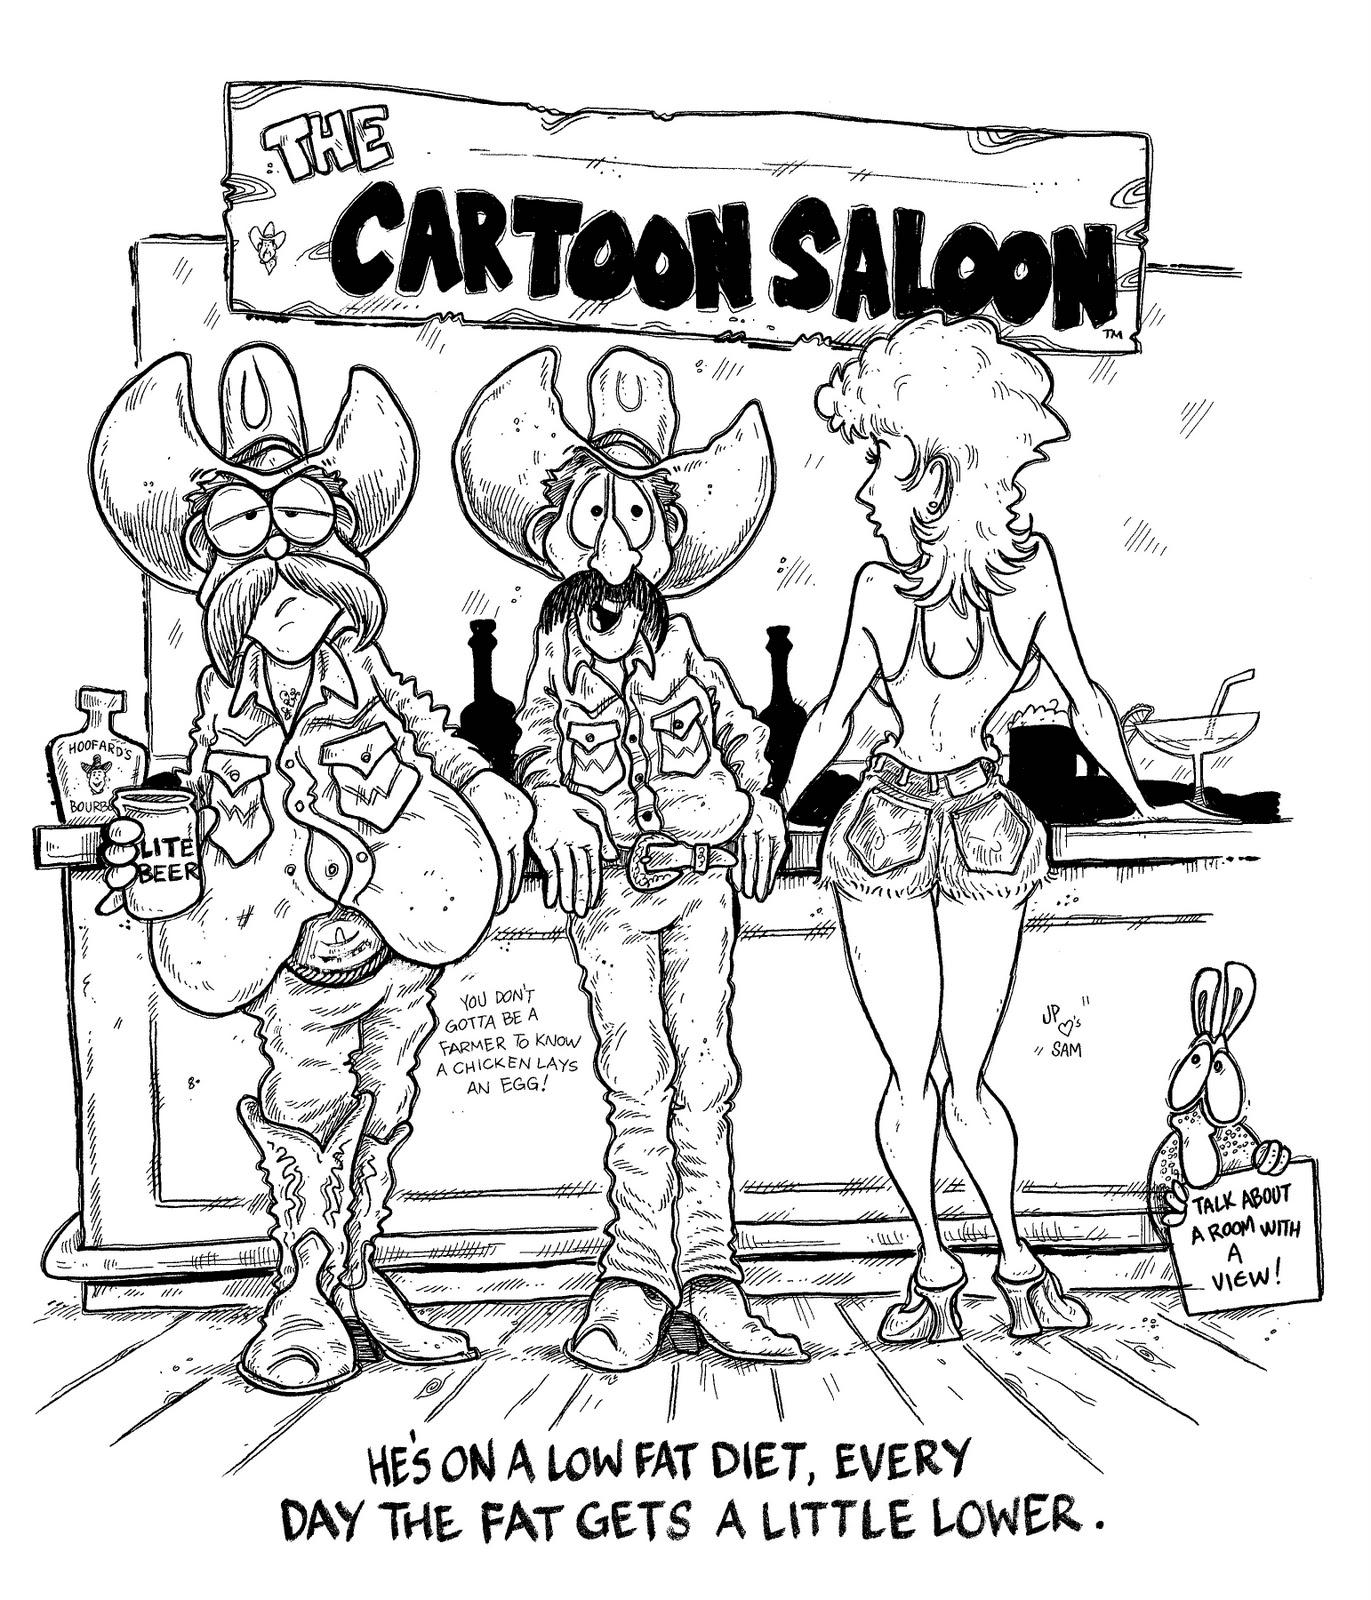 JP RANKIN The Art Of THE CARTOON COWBOY LOWFAT DIET